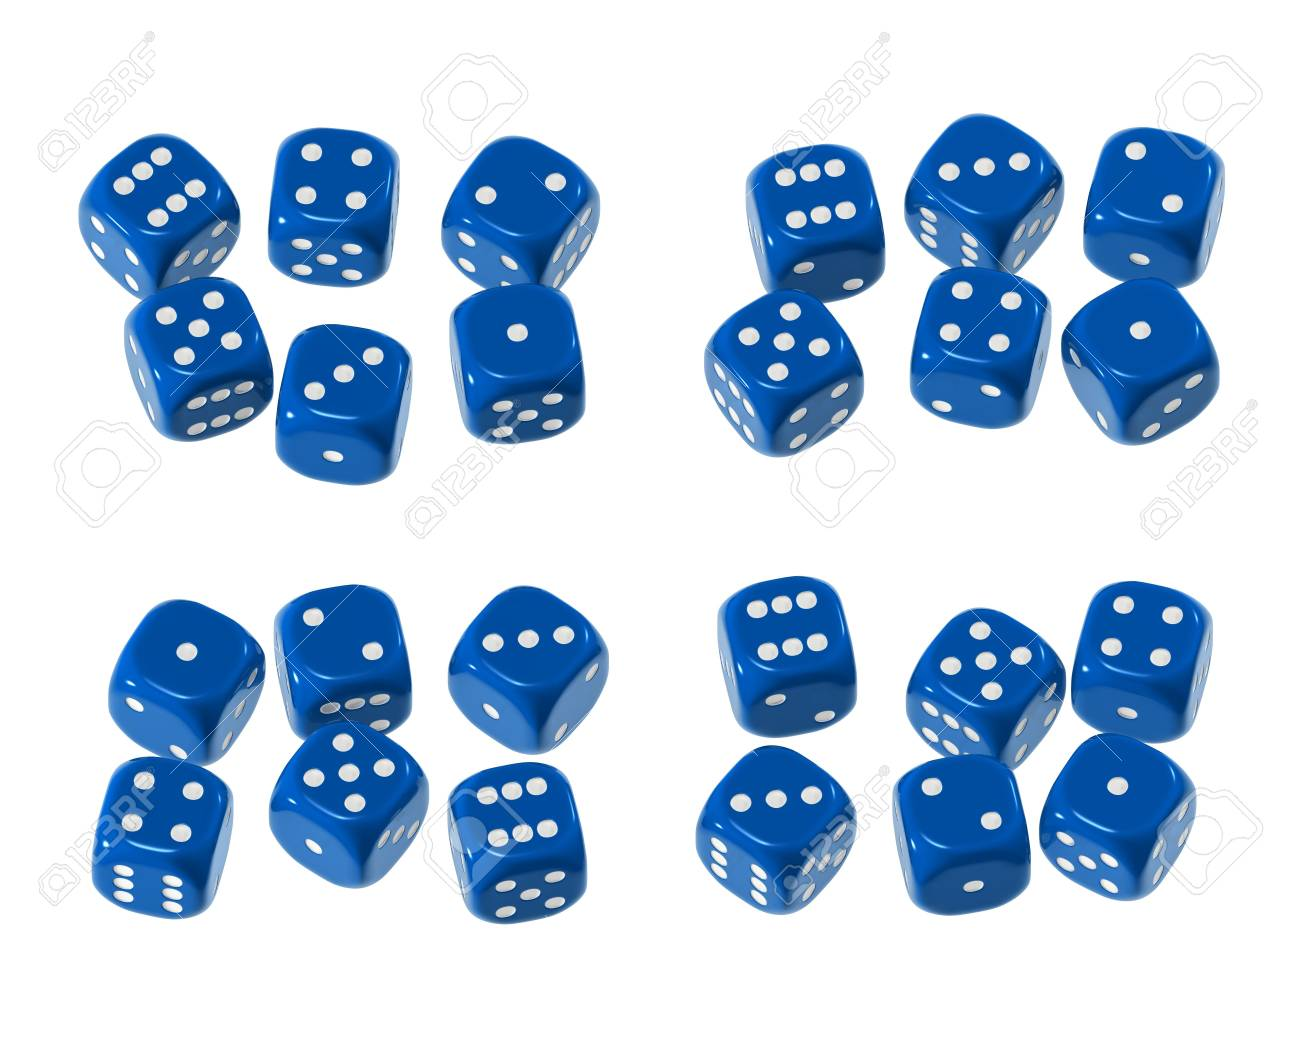 Blue shiny plastic-like with white pips - isolated Stock Photo - 4942454